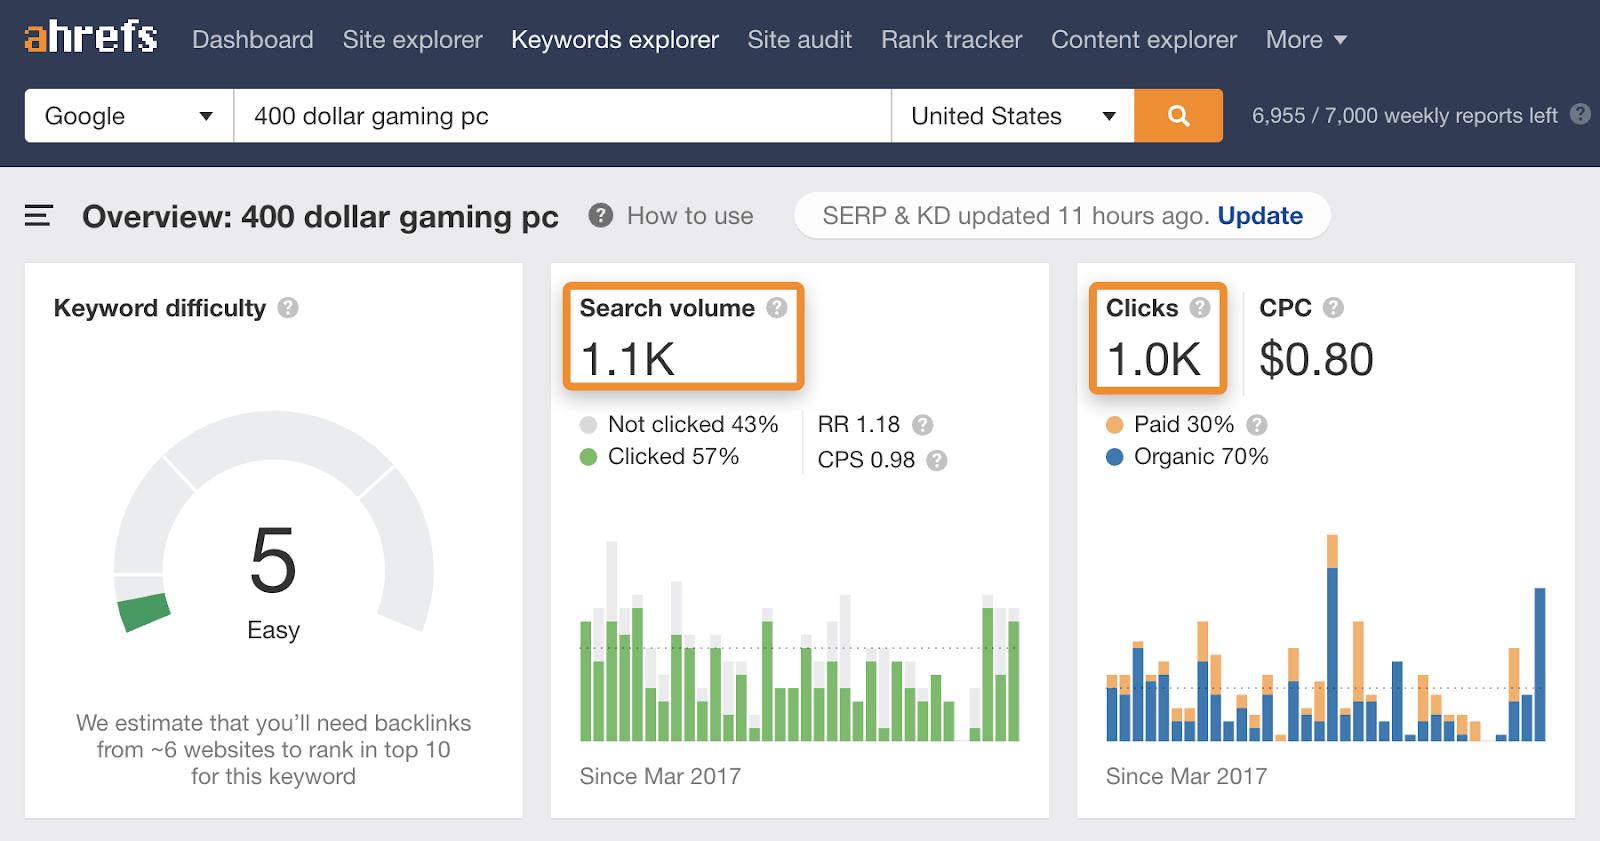 25 400 dolloar gaming pc traffic potential 1